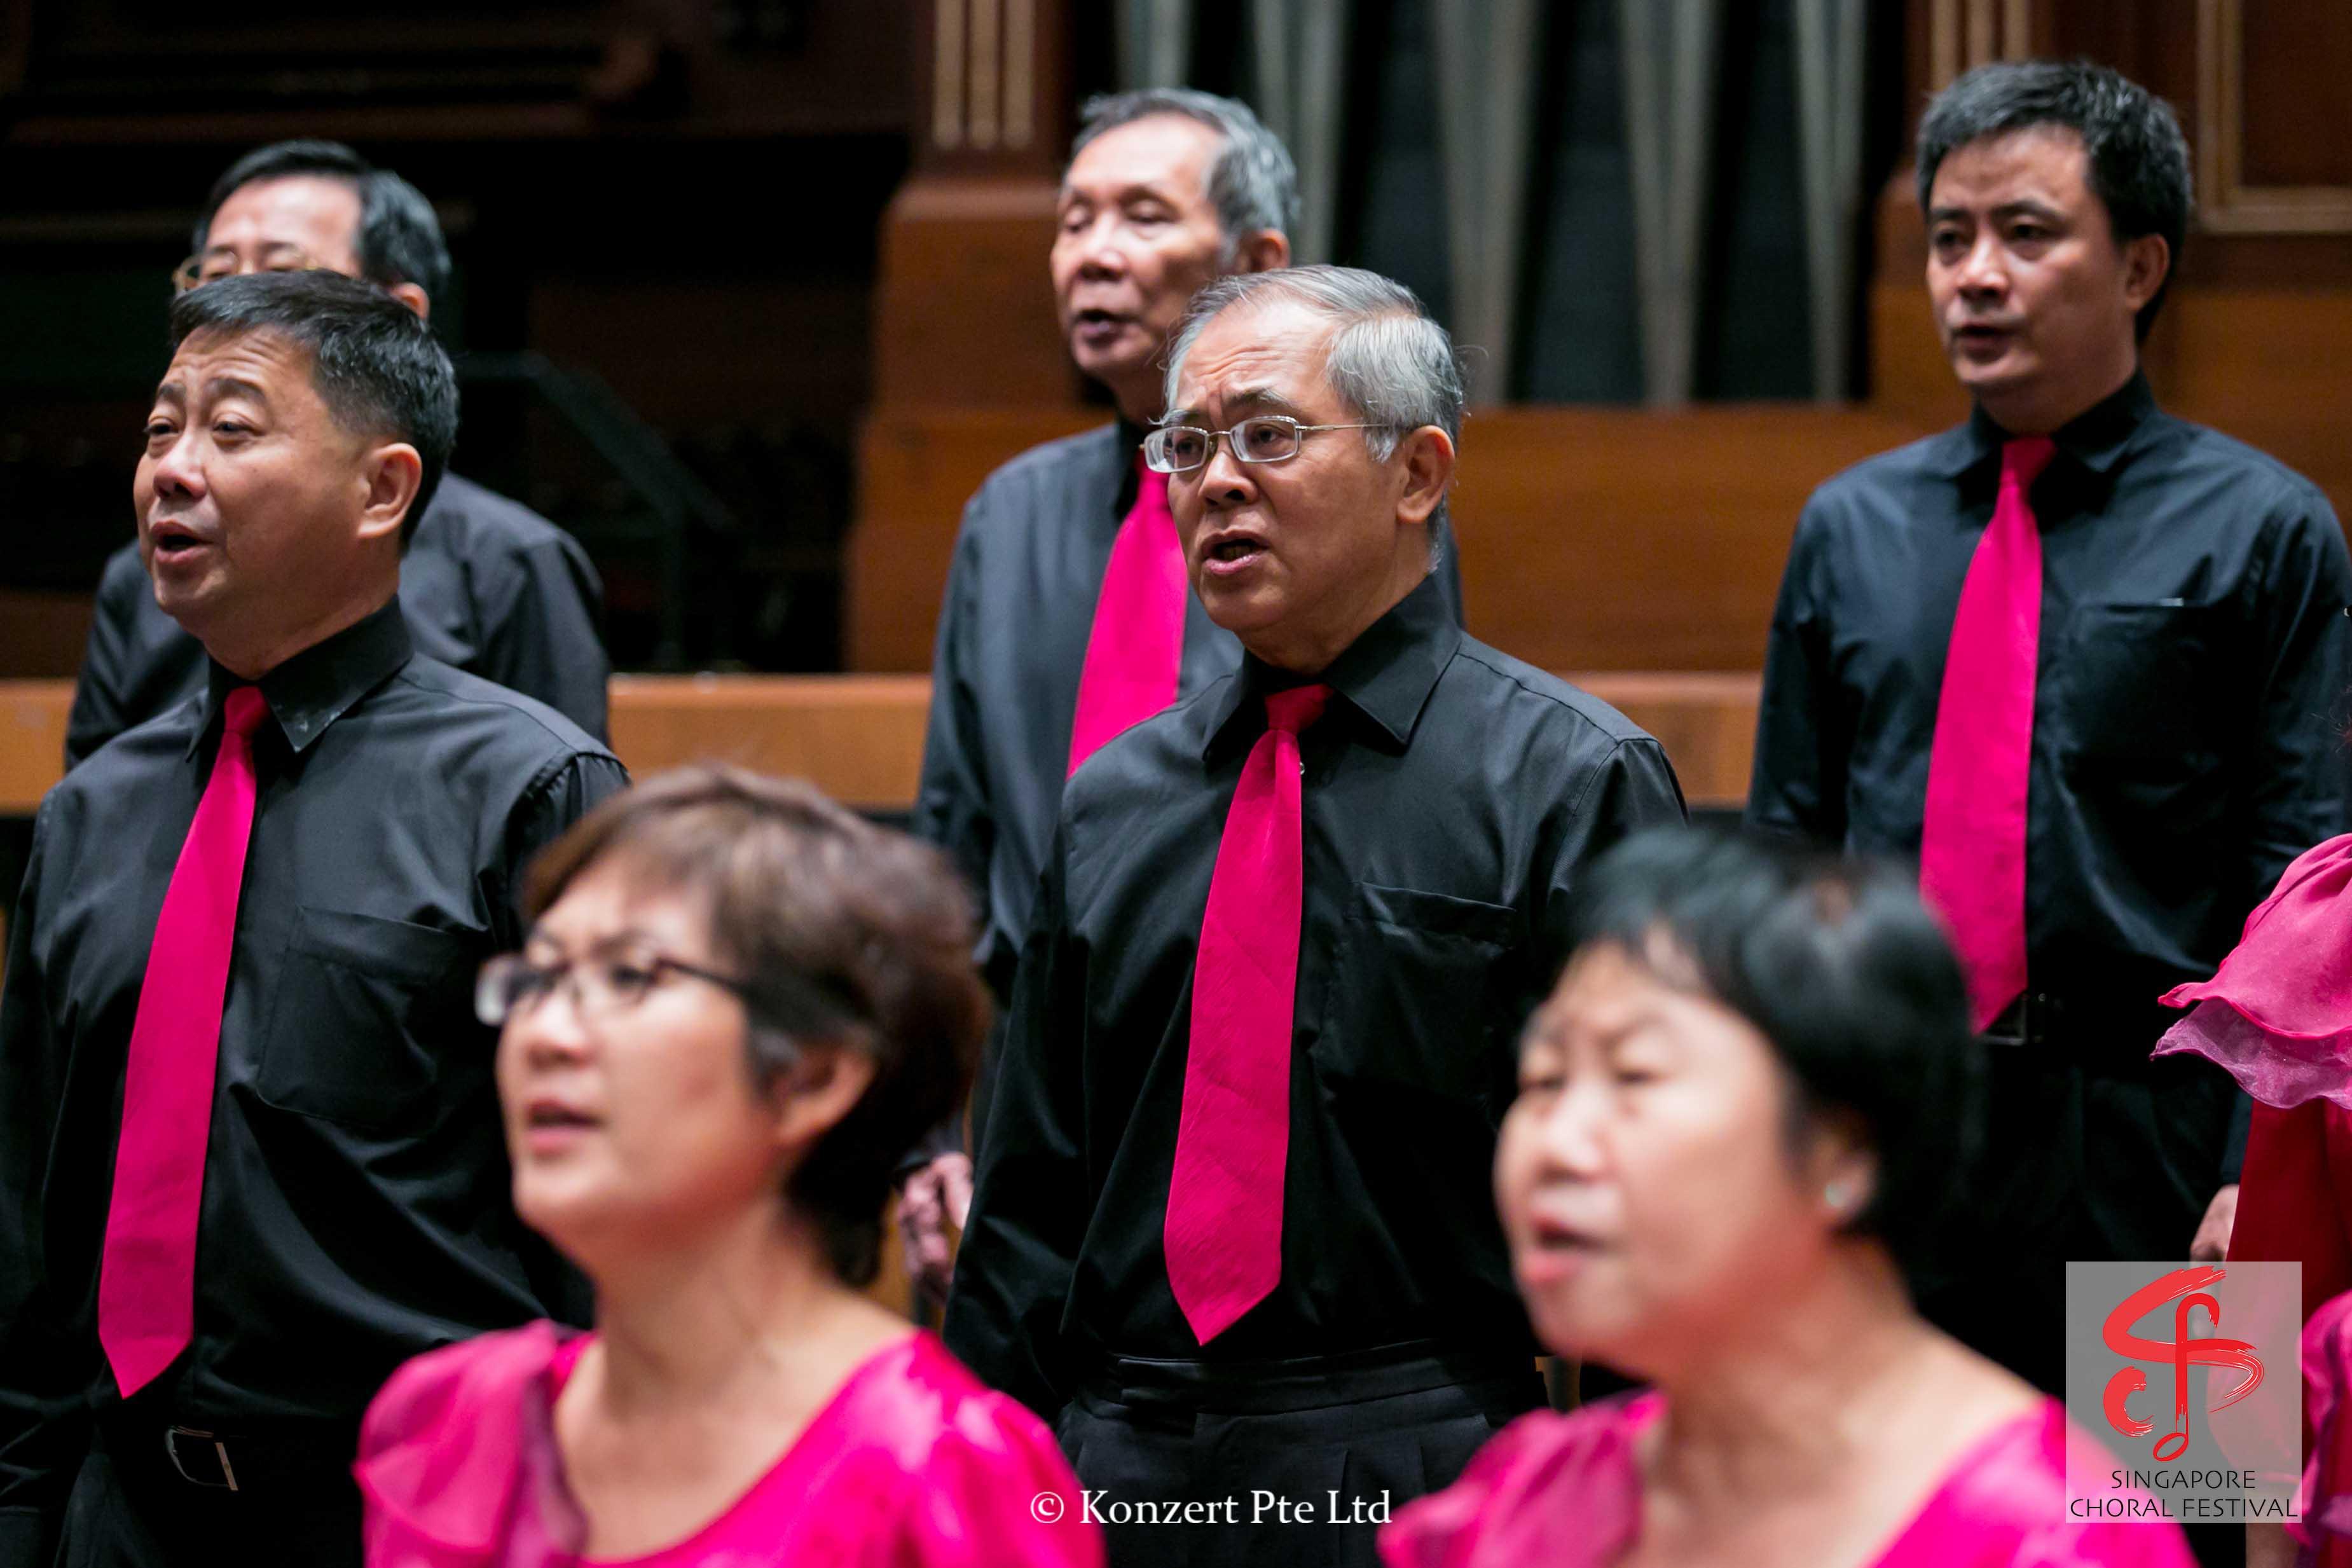 Singapore Choral Festival 7-8-15 (32).jpg